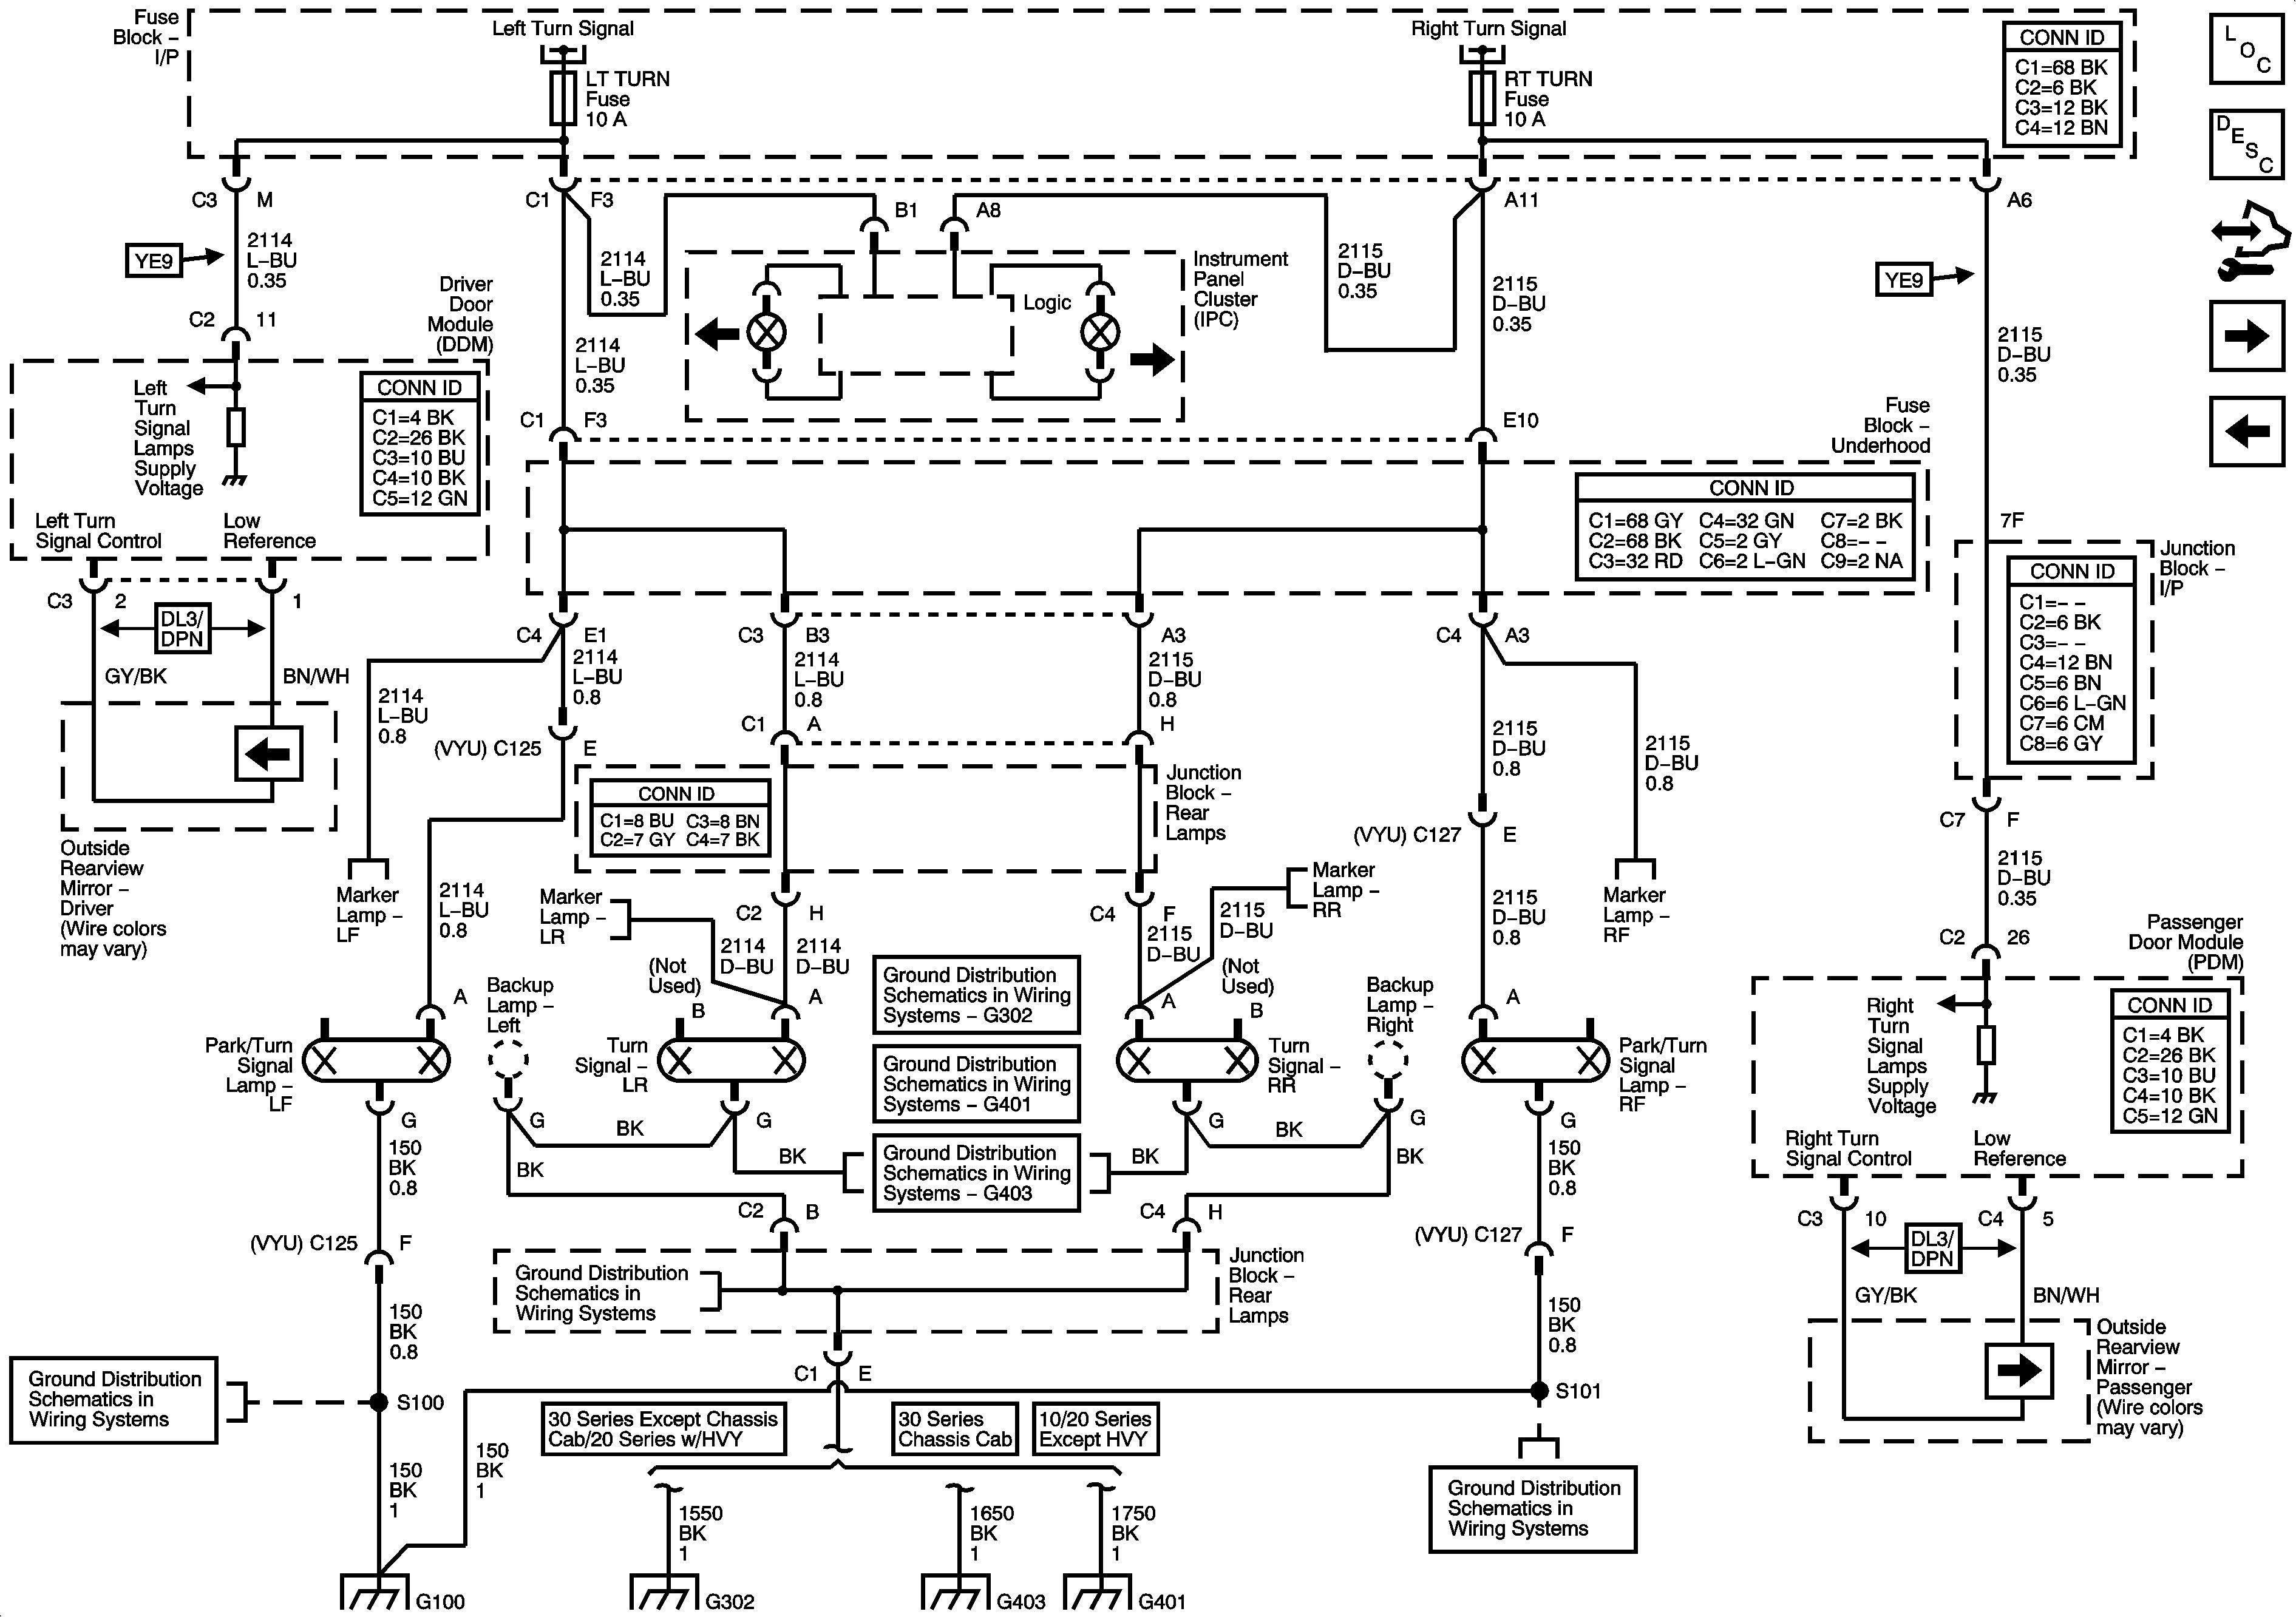 2002 chevy silverado 2500hd trailer wiring diagram   wiring diagram 179  refund  avemarisstella.it